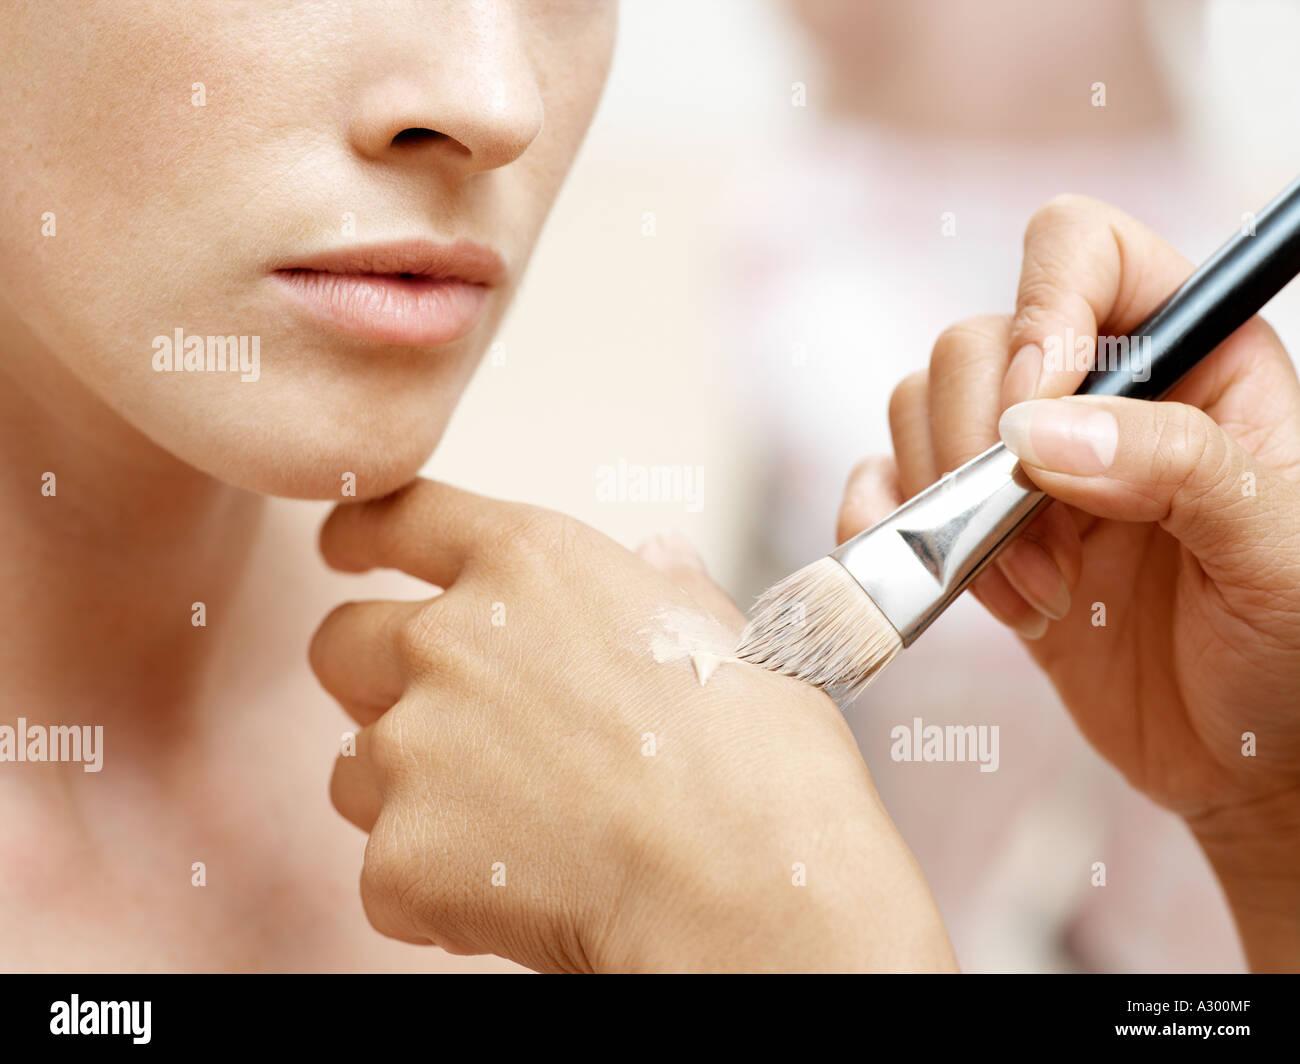 Woman having make-up done - Stock Image